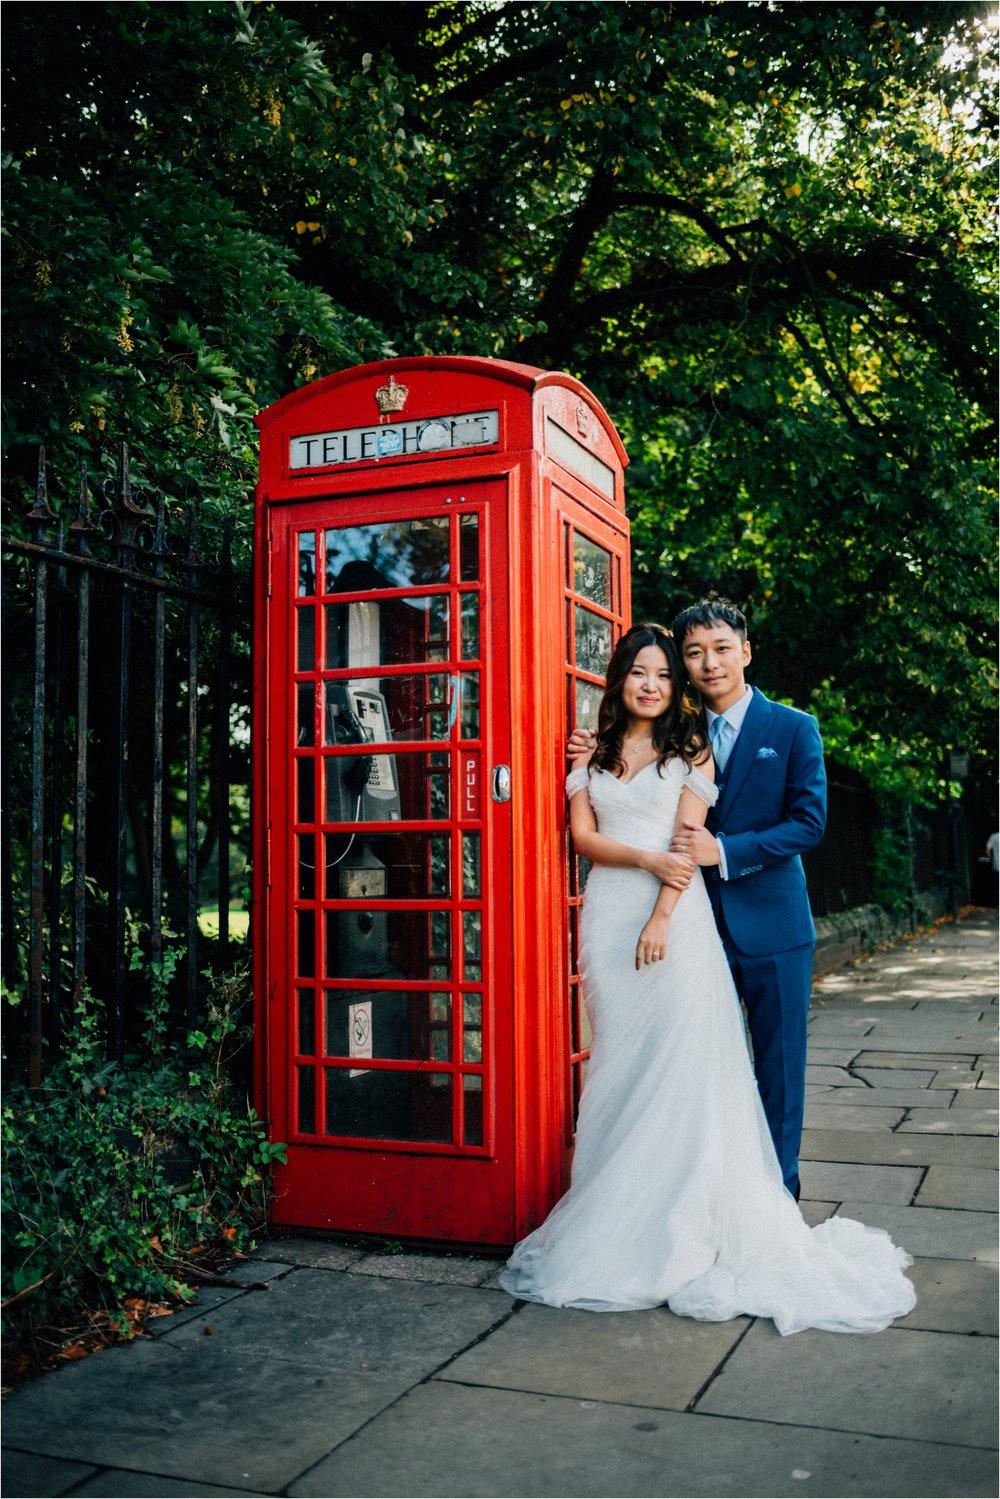 York city elopement wedding photographer_0052.jpg